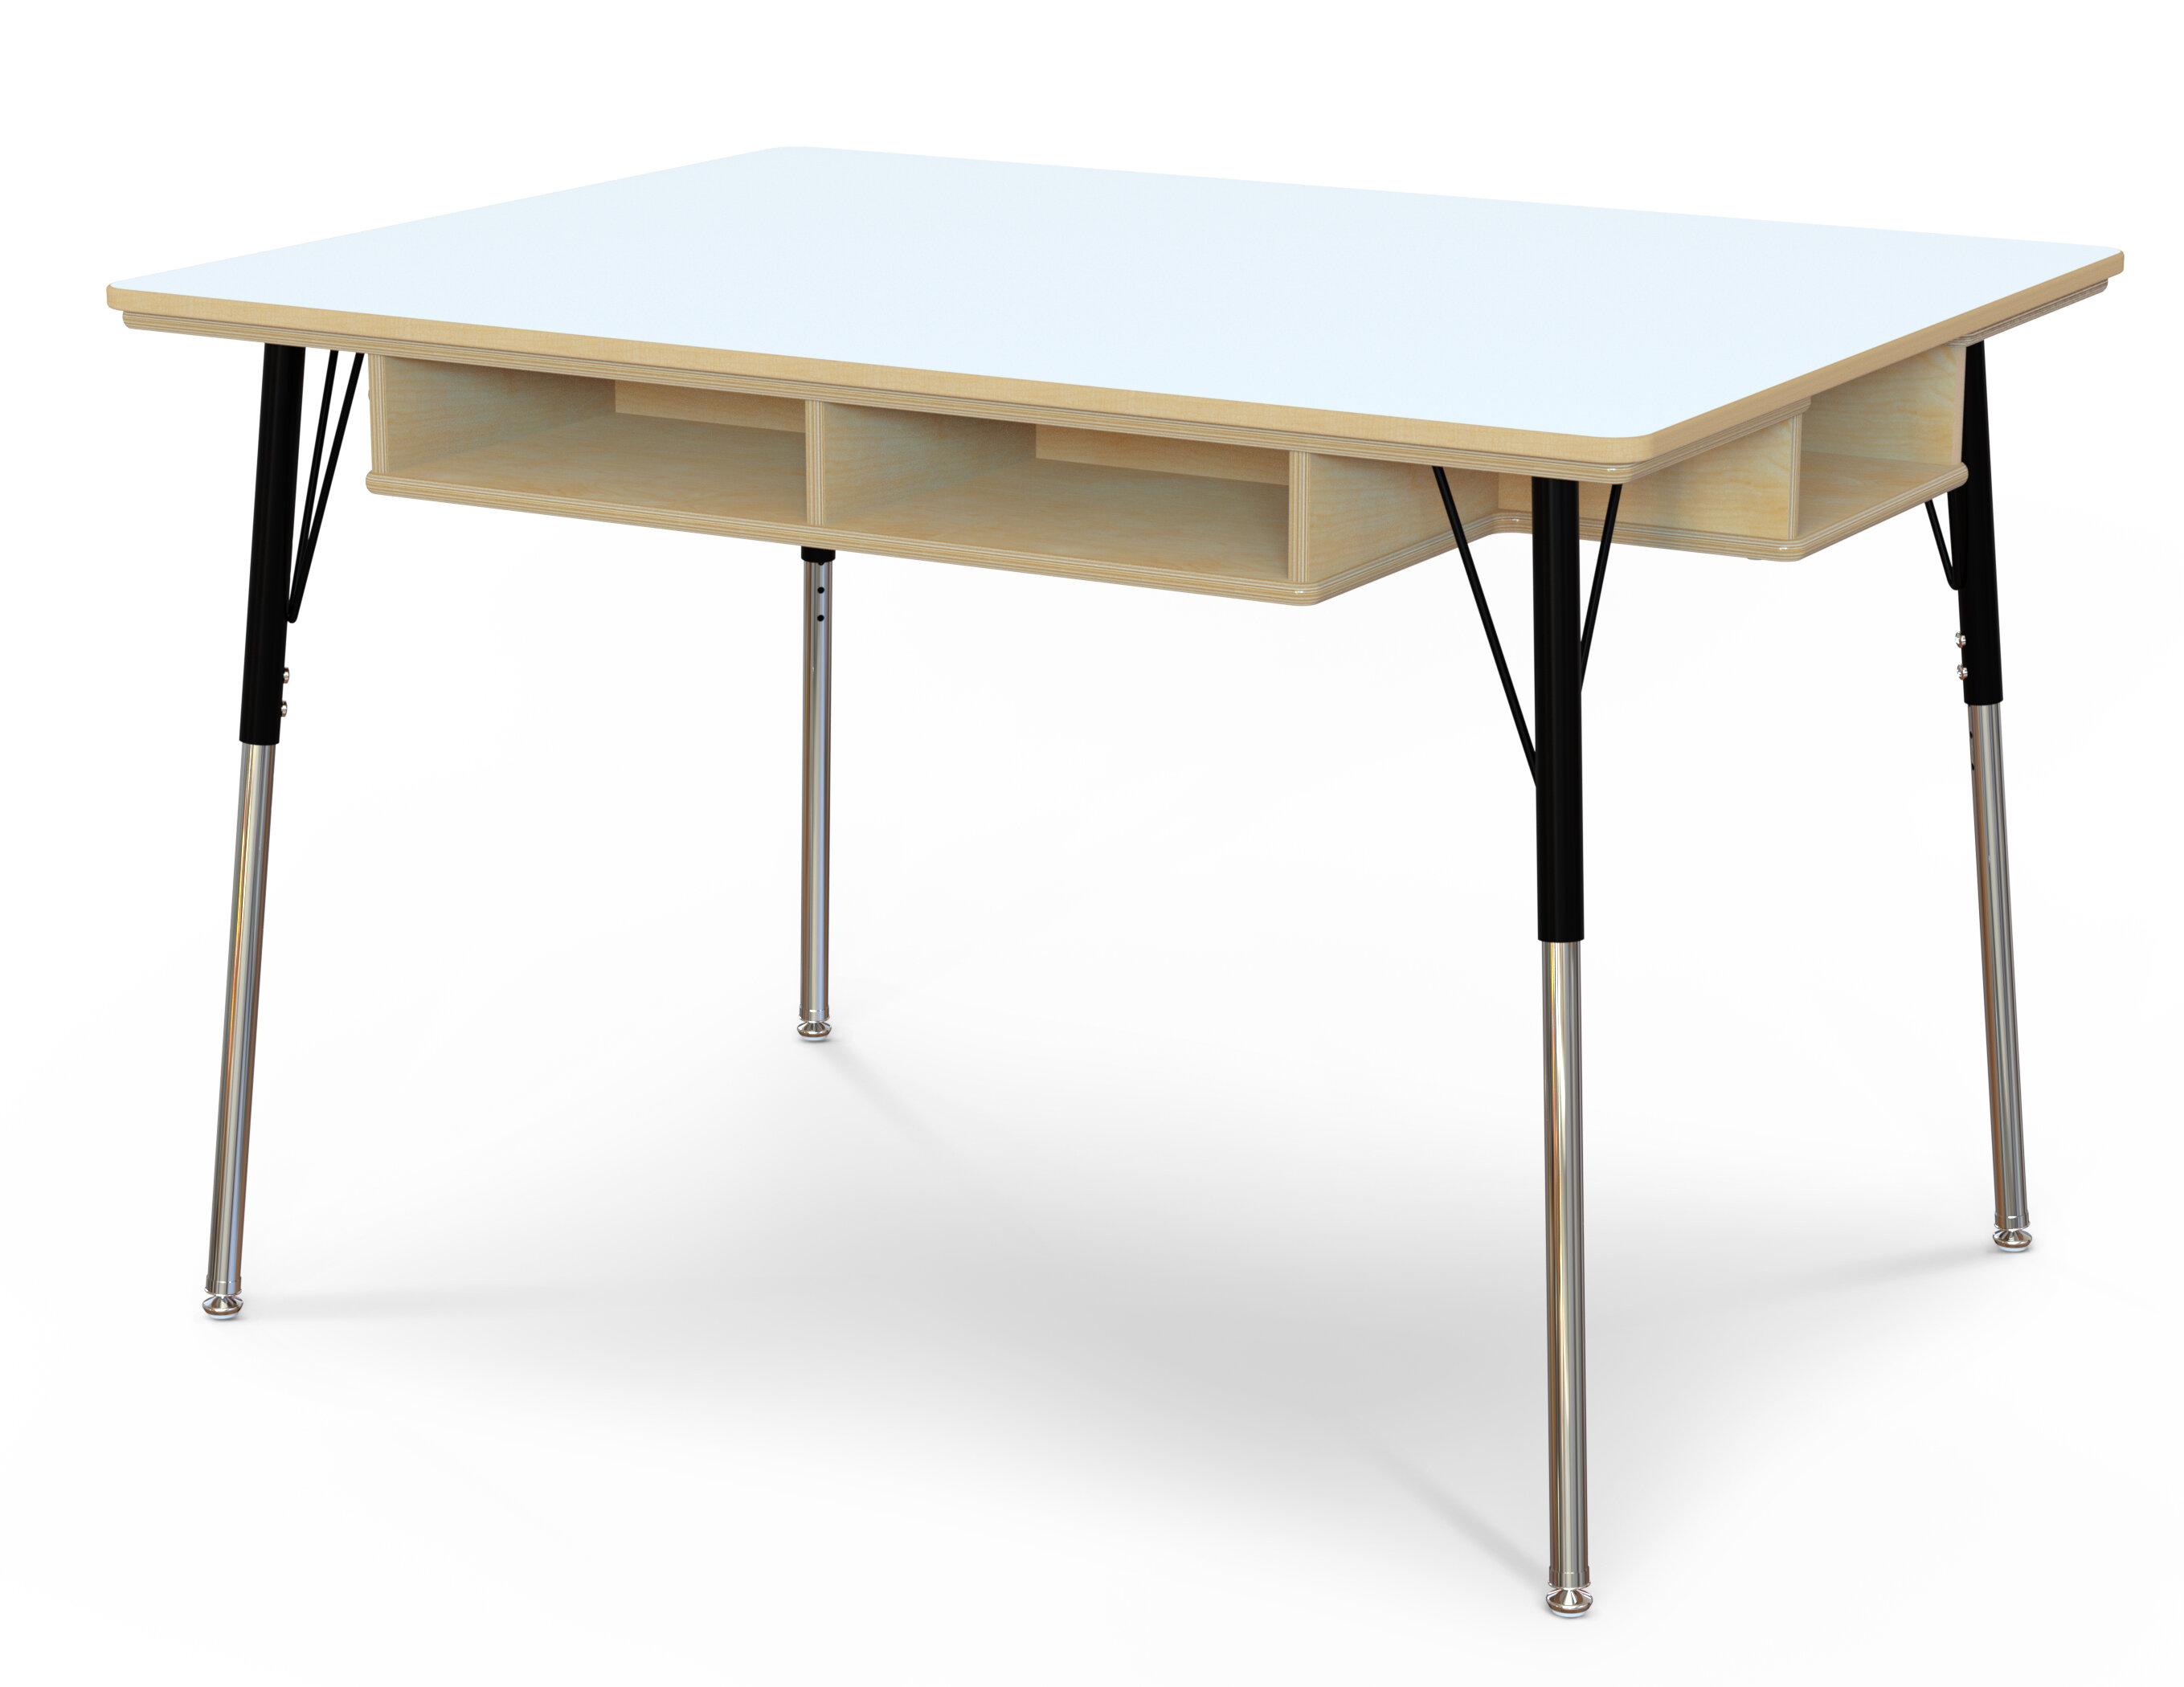 30 in. W x 48 in. D x 24 in. - 31 in. H. - Yellow Jonti-Craft Ridgeline Kydz Rectangular Activity Table